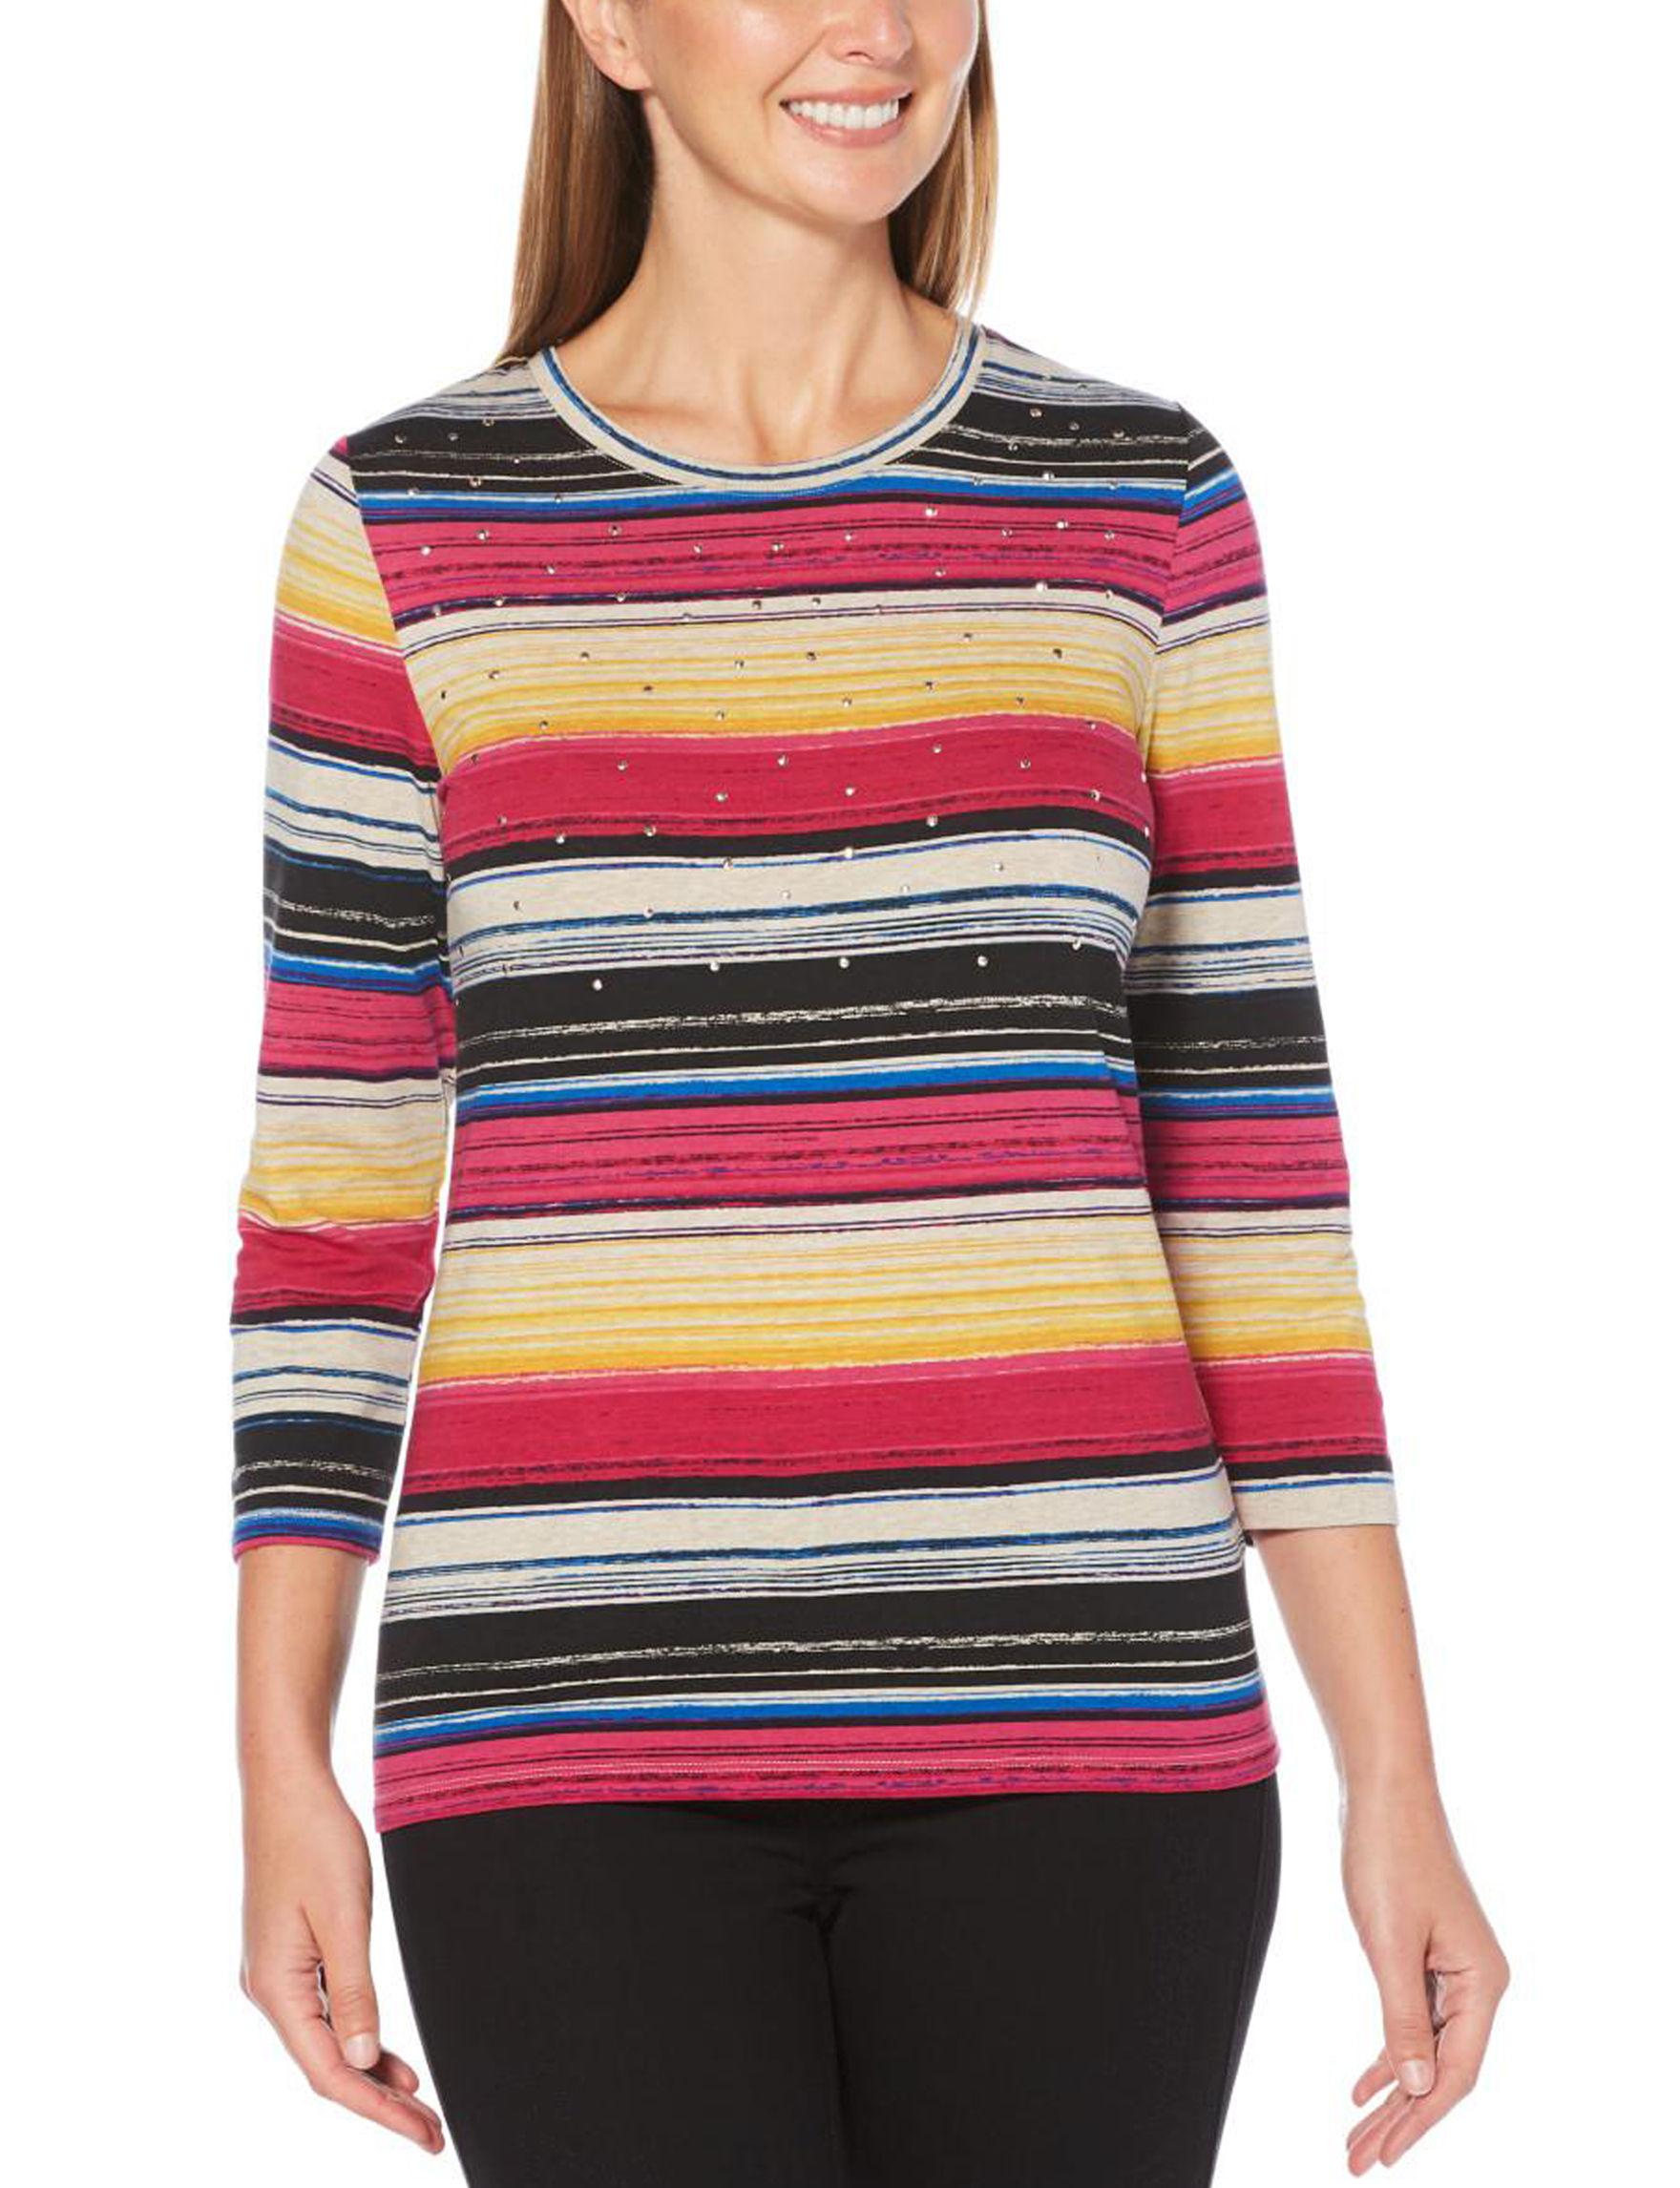 Rafaella Pink / Multi Shirts & Blouses